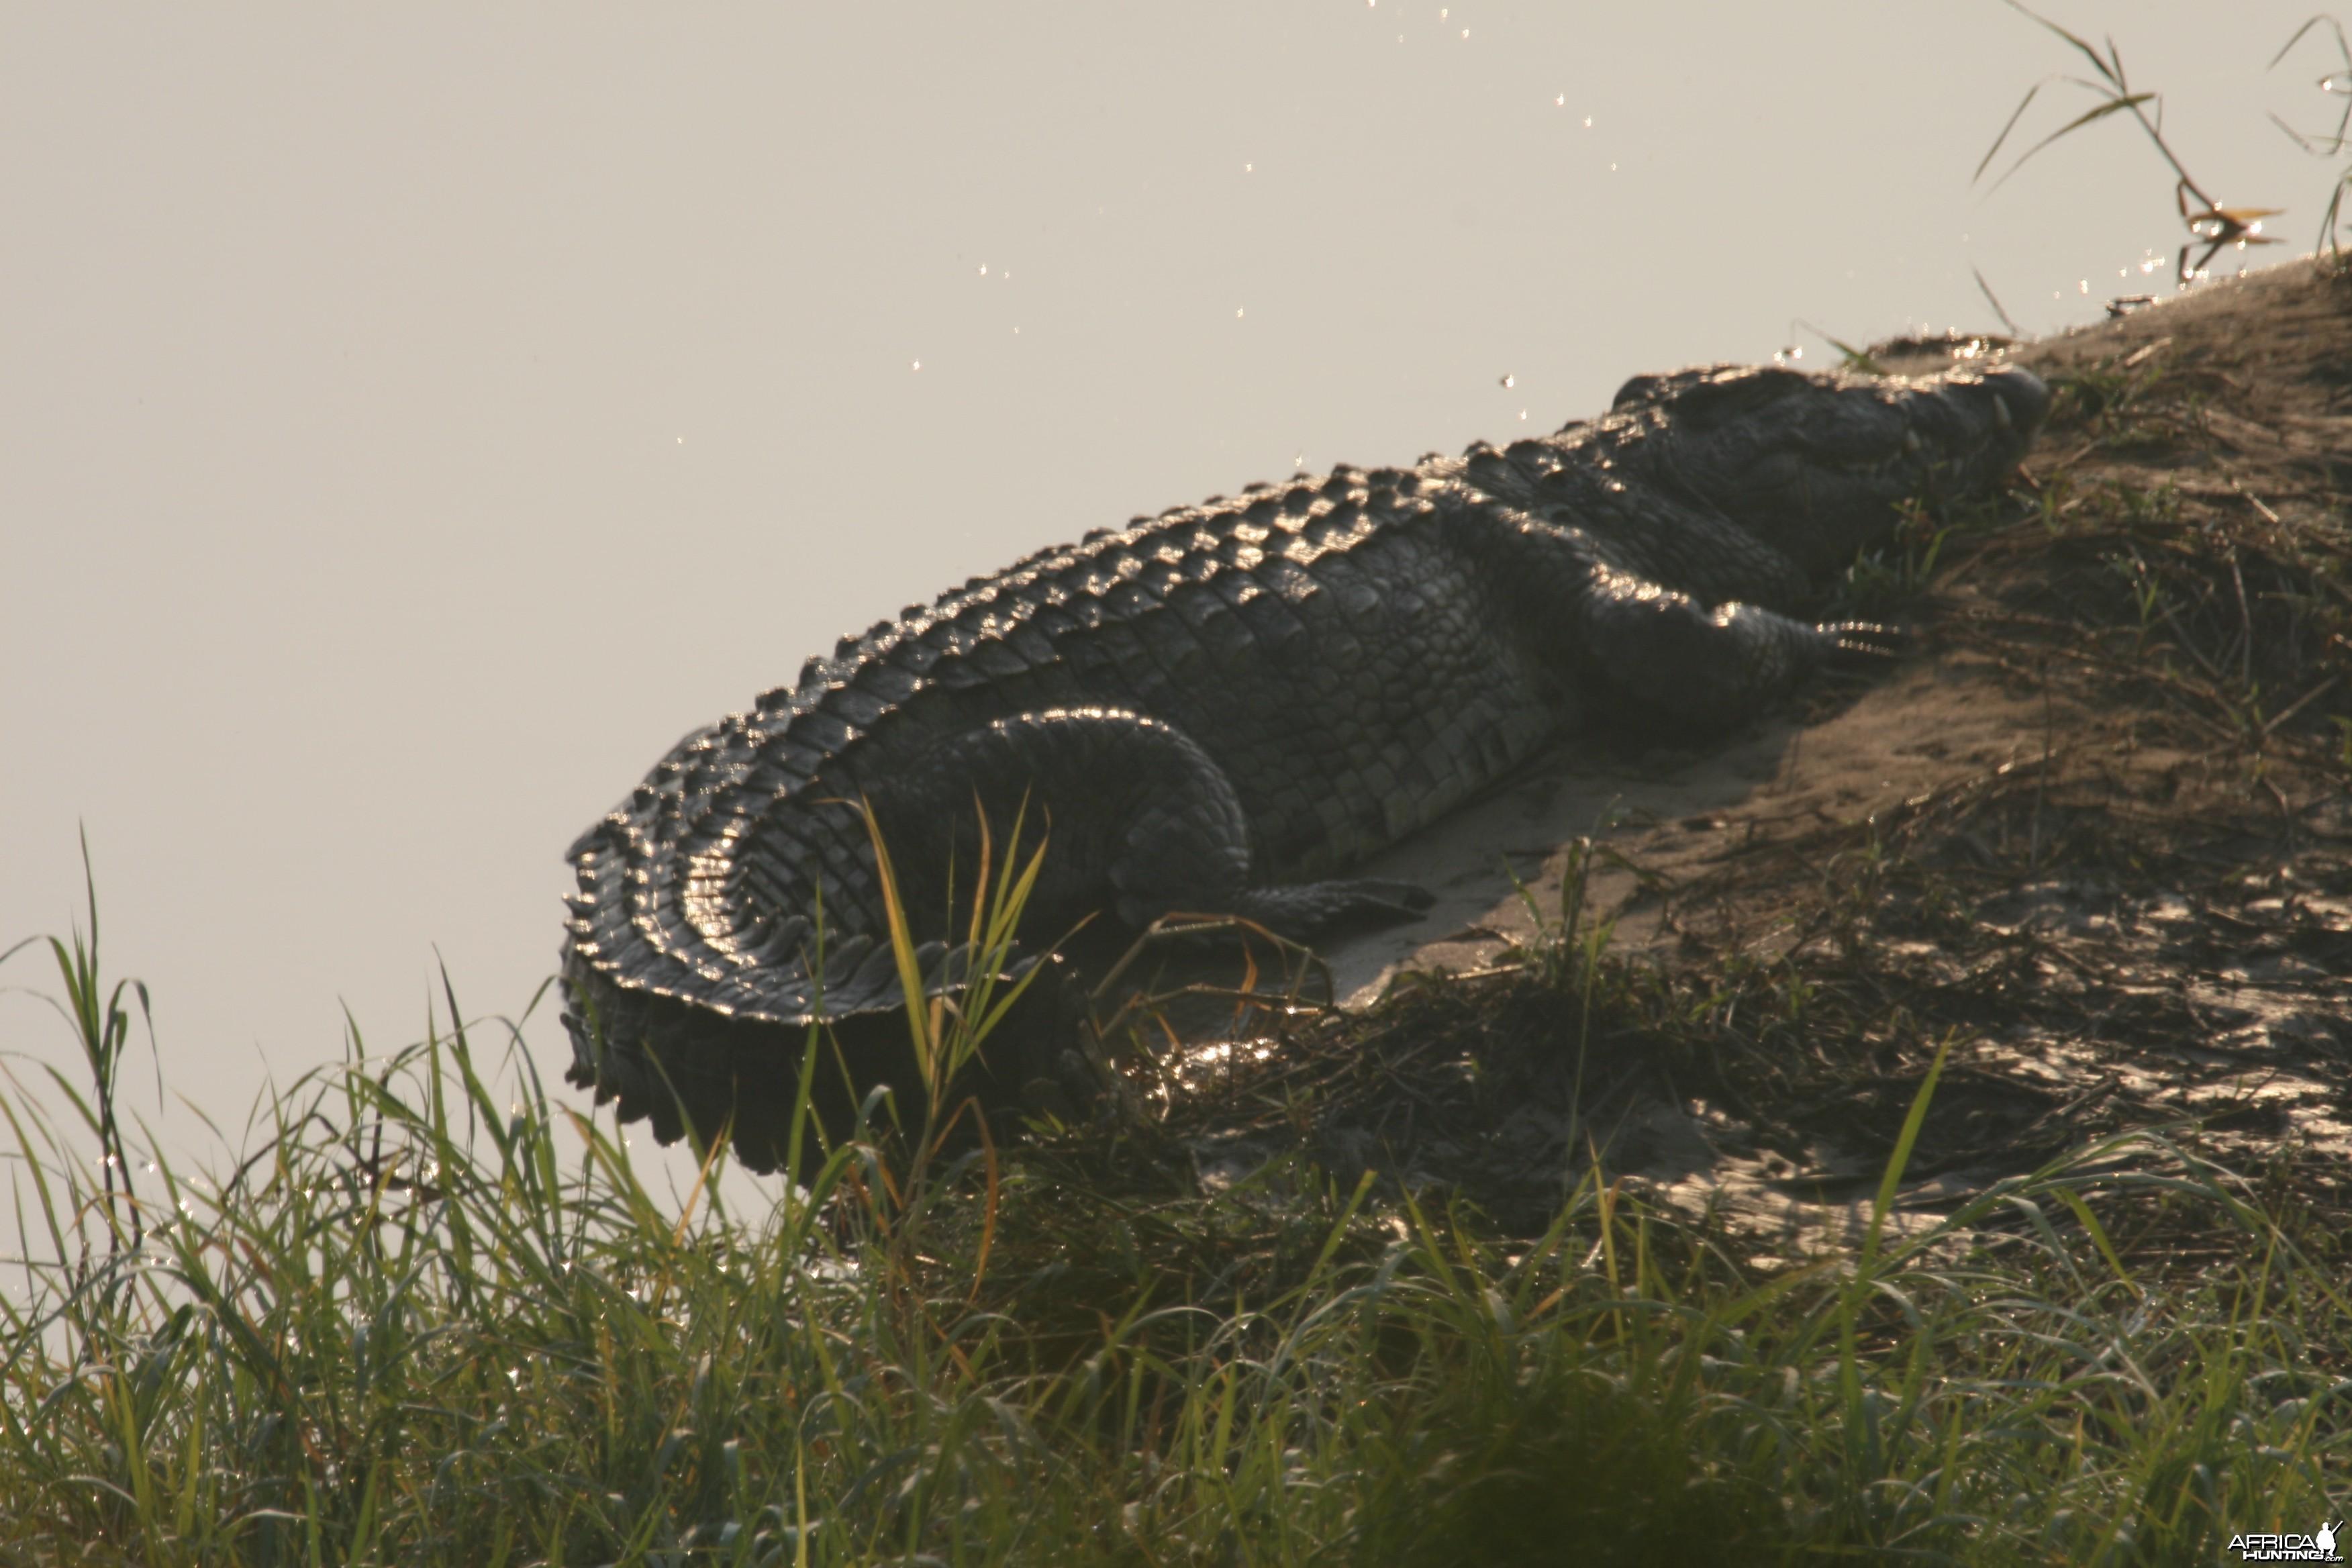 Croc bathing